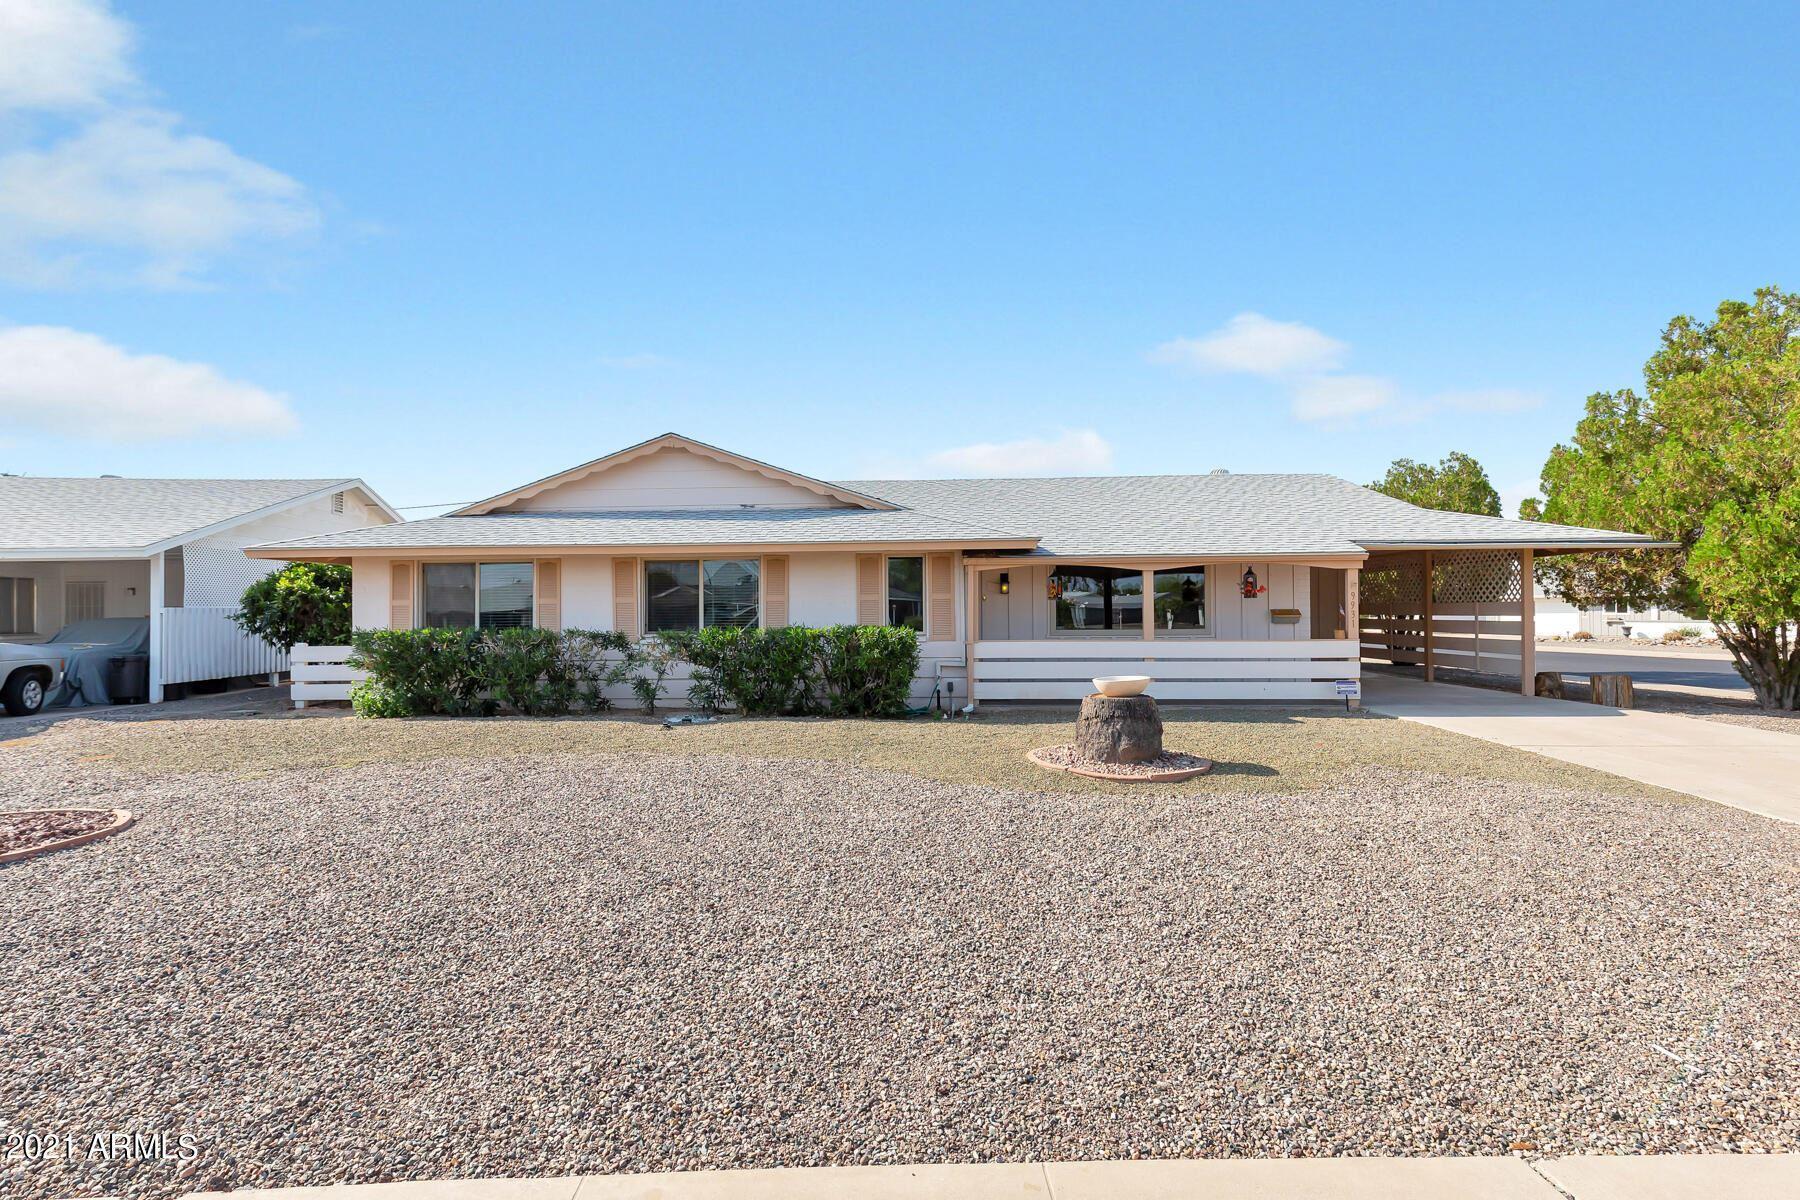 9931 W Sun City Boulevard, Sun City, AZ 85351 - MLS#: 6292601